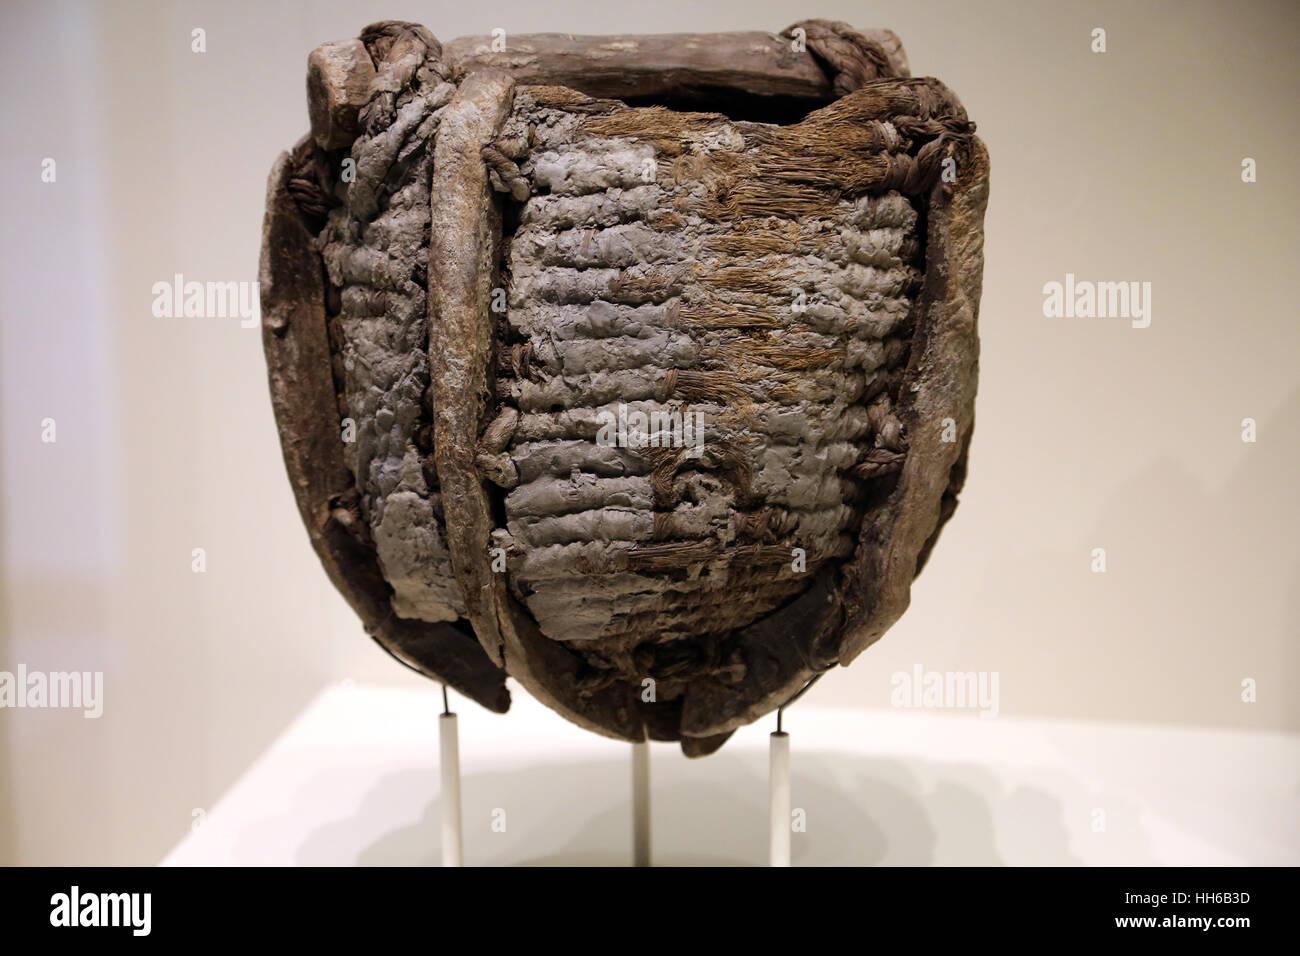 Roman Hispania. Mining. Equipment. Basket. Wood and plant fibres. 1st century. Rio Tinto, Huelva. National Archaeological - Stock Image